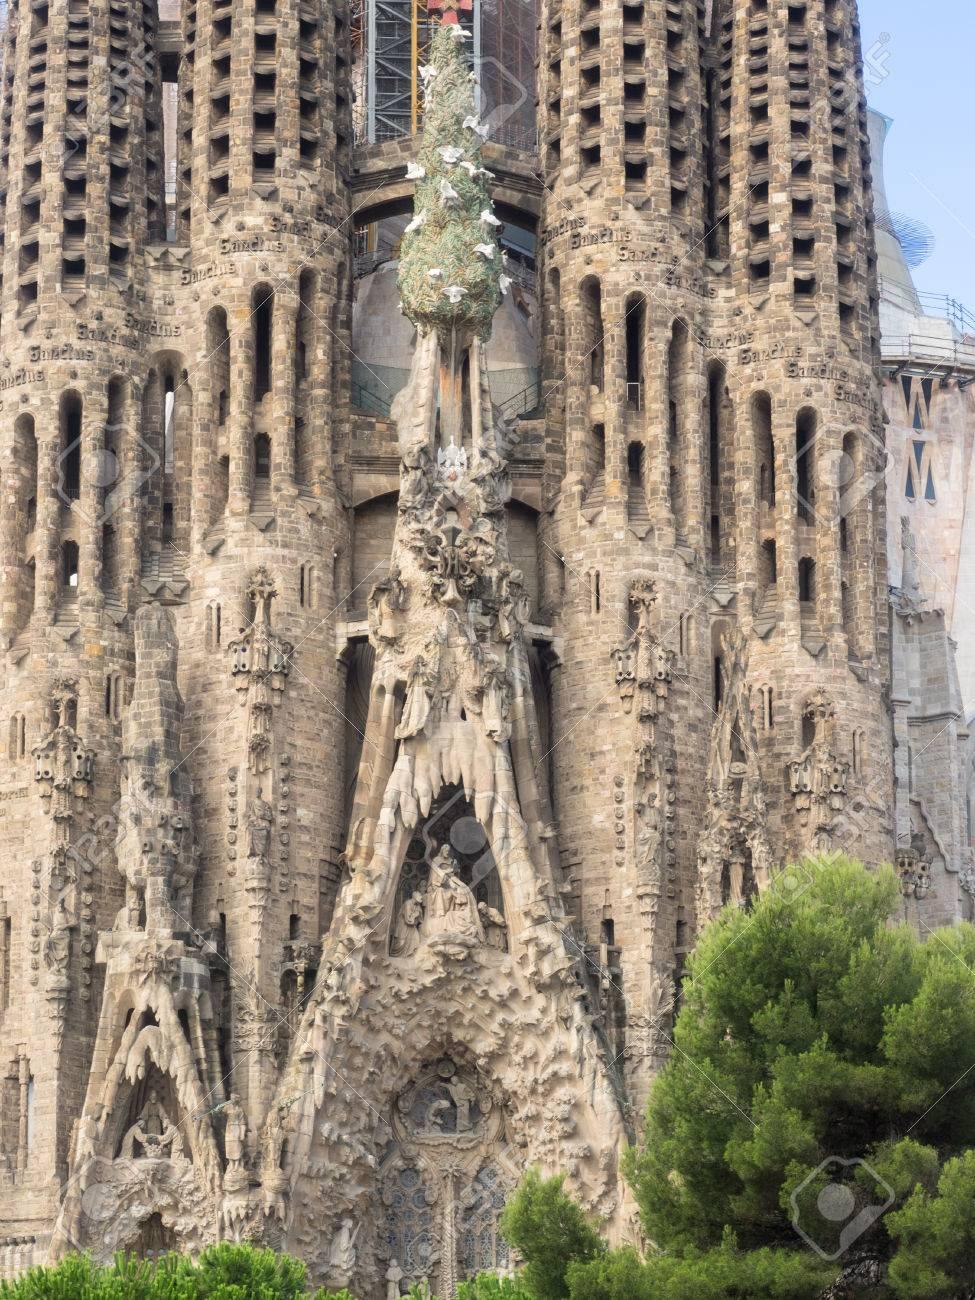 baslica i templo expiatorio de la sagrada familia es una iglesia catlica romana grande en barcelona